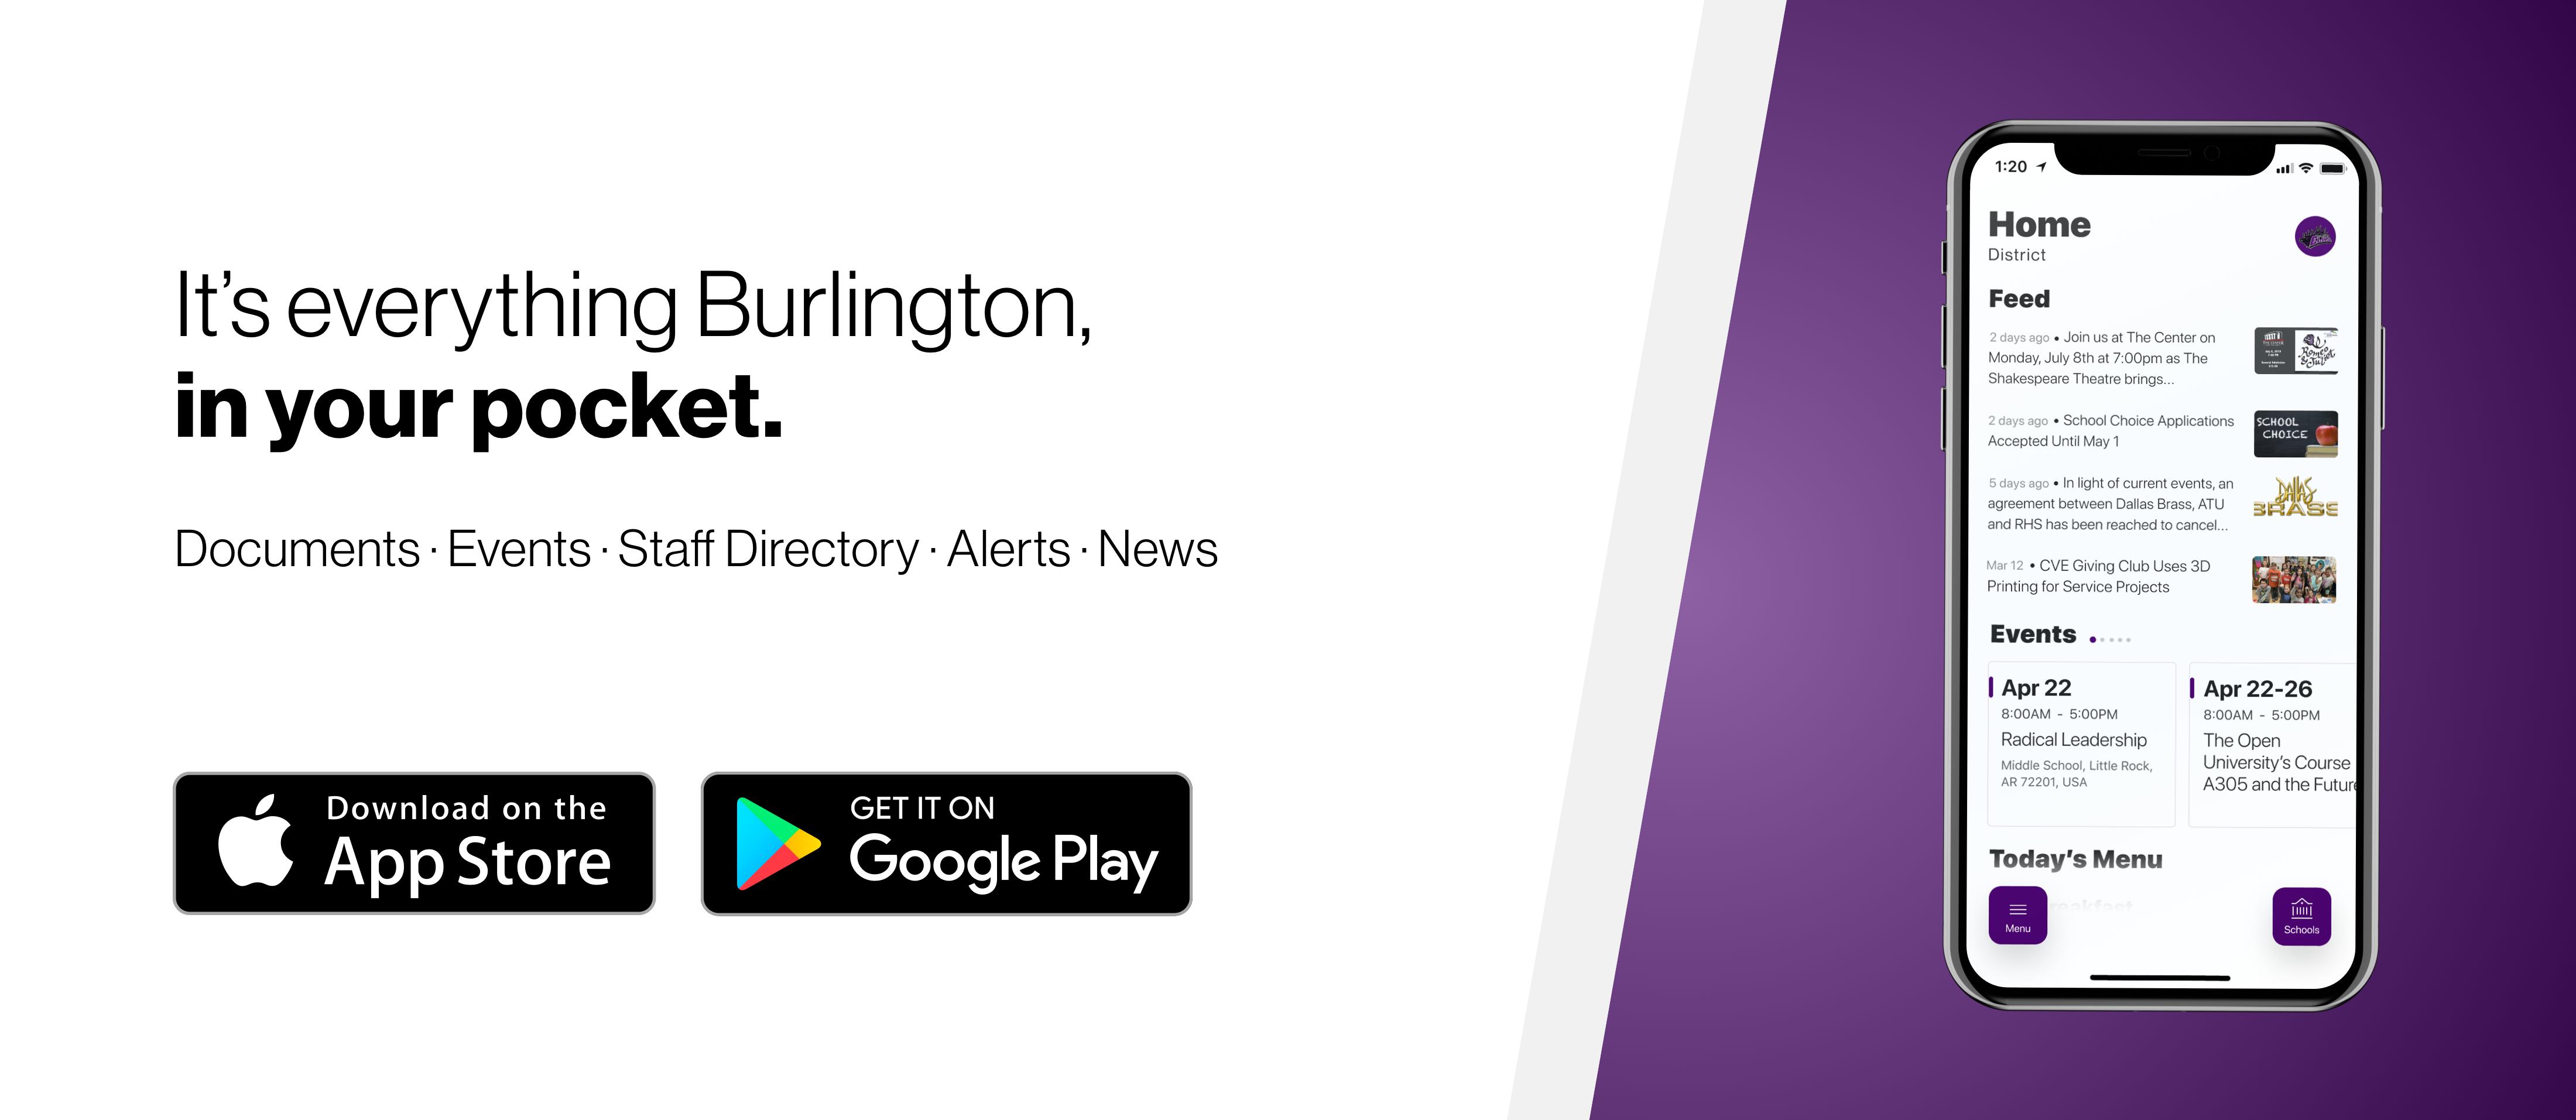 burlington schools mobile app